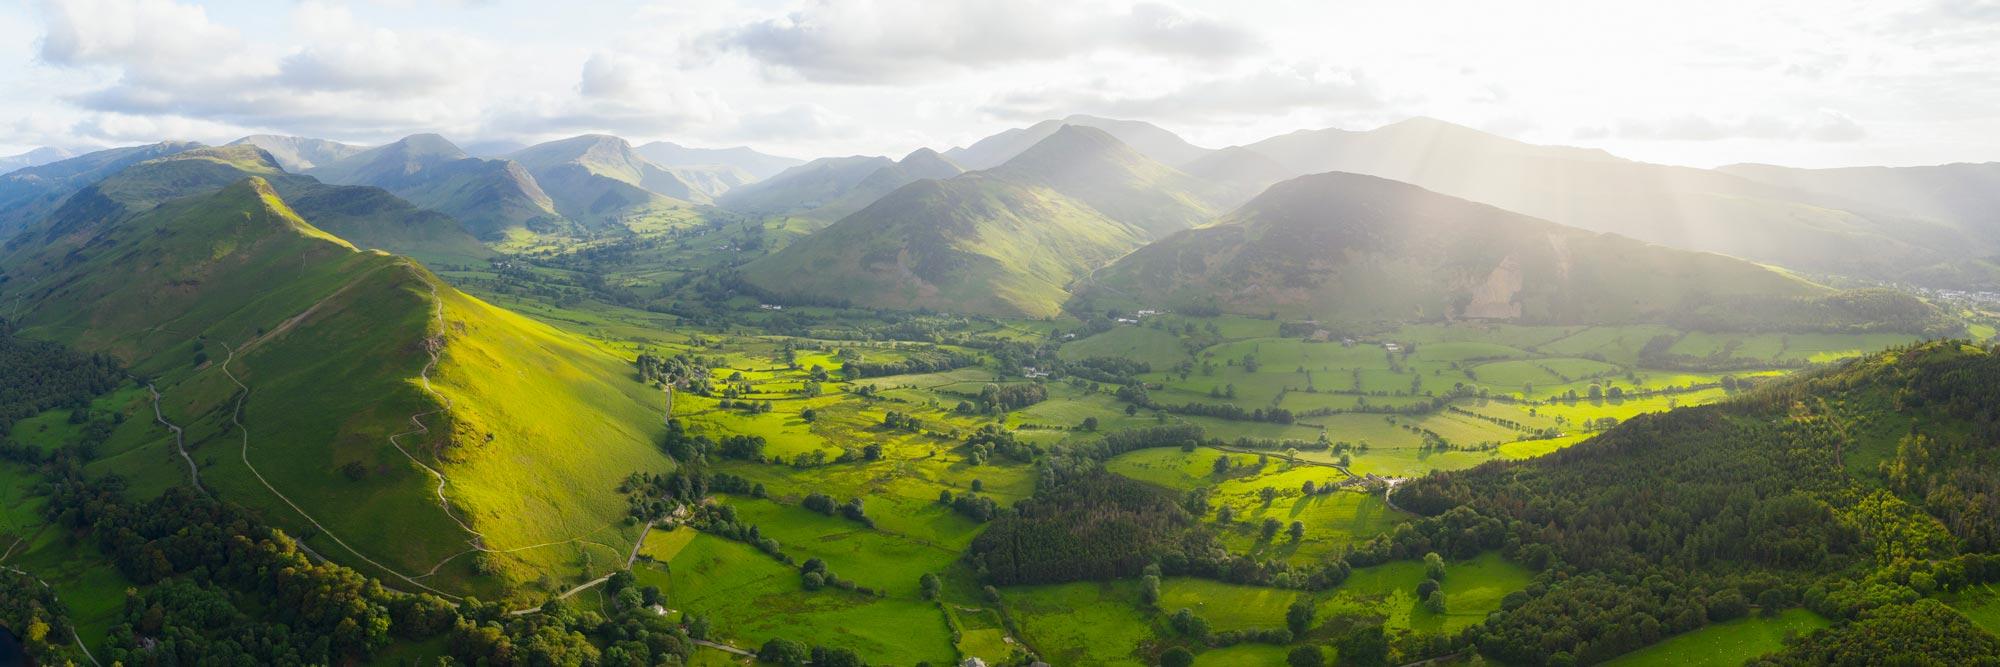 Cat bells hike England